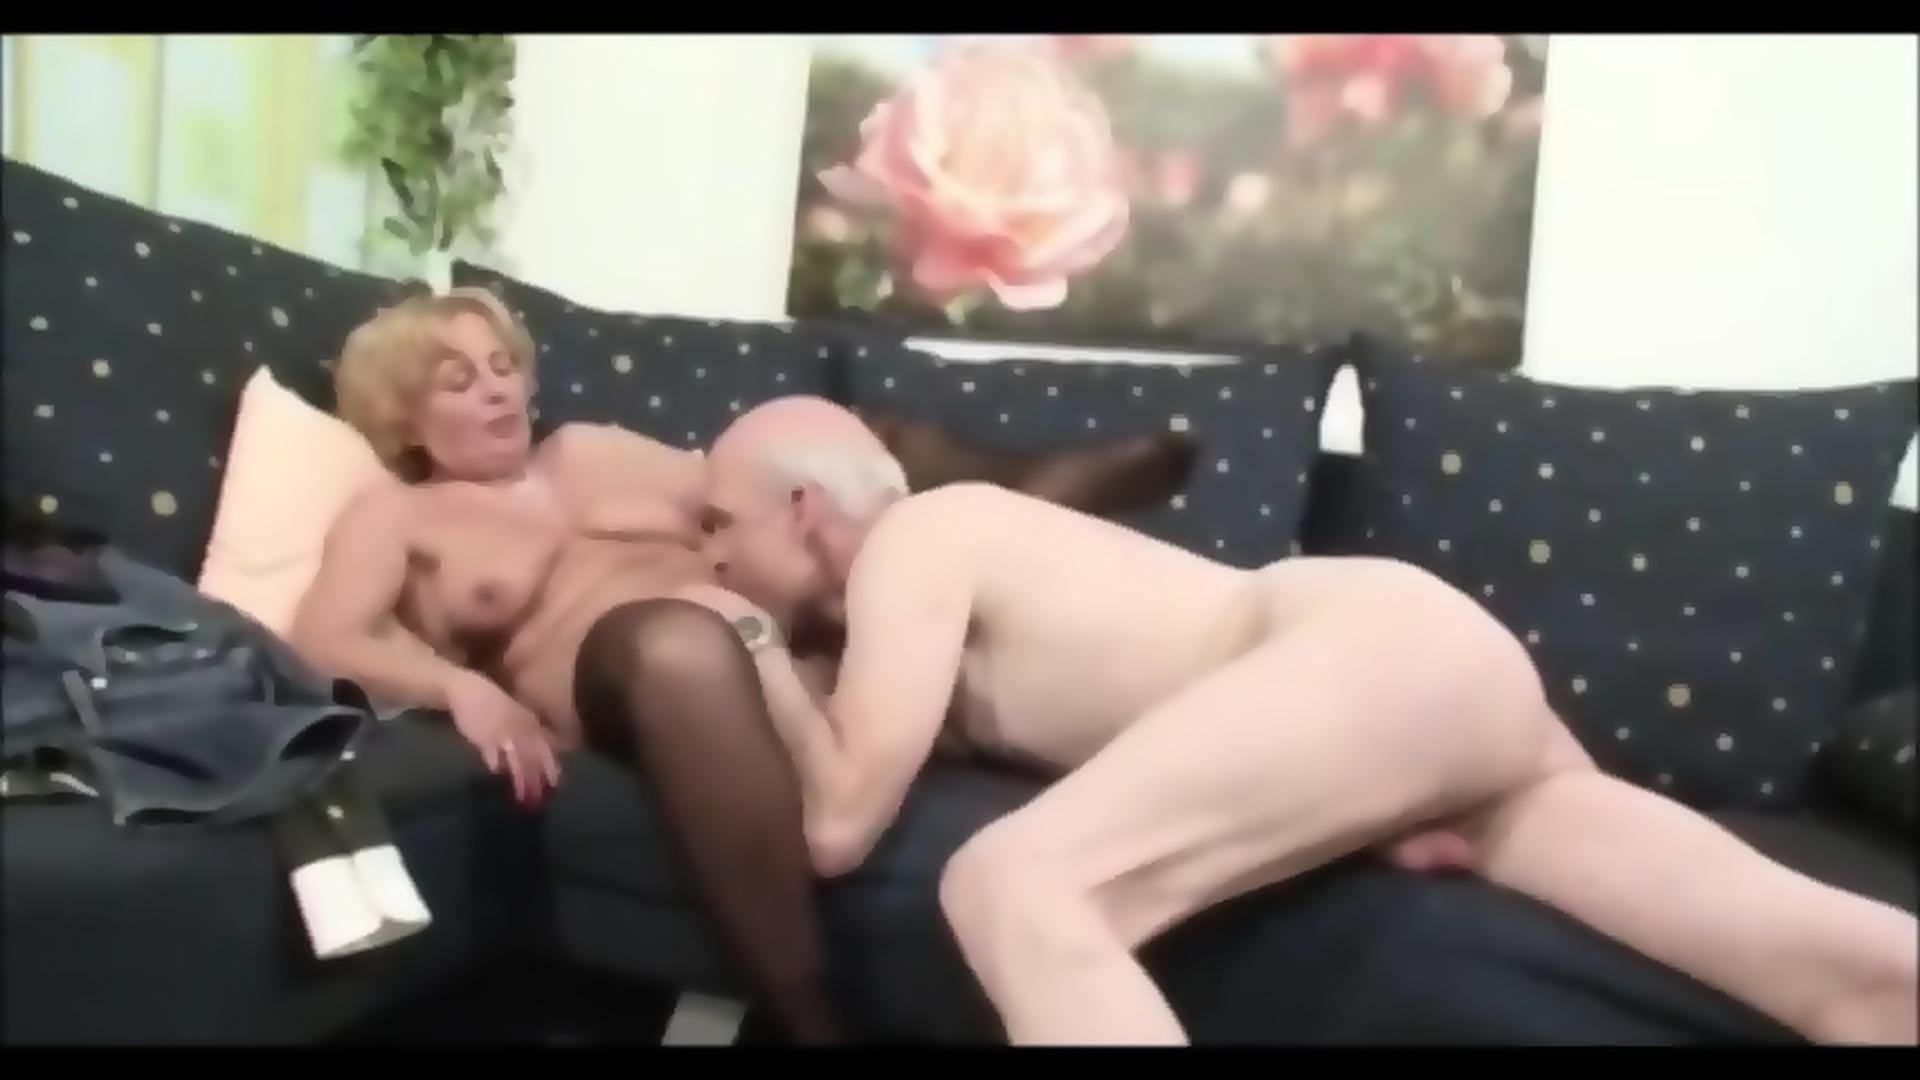 Nude stretching women